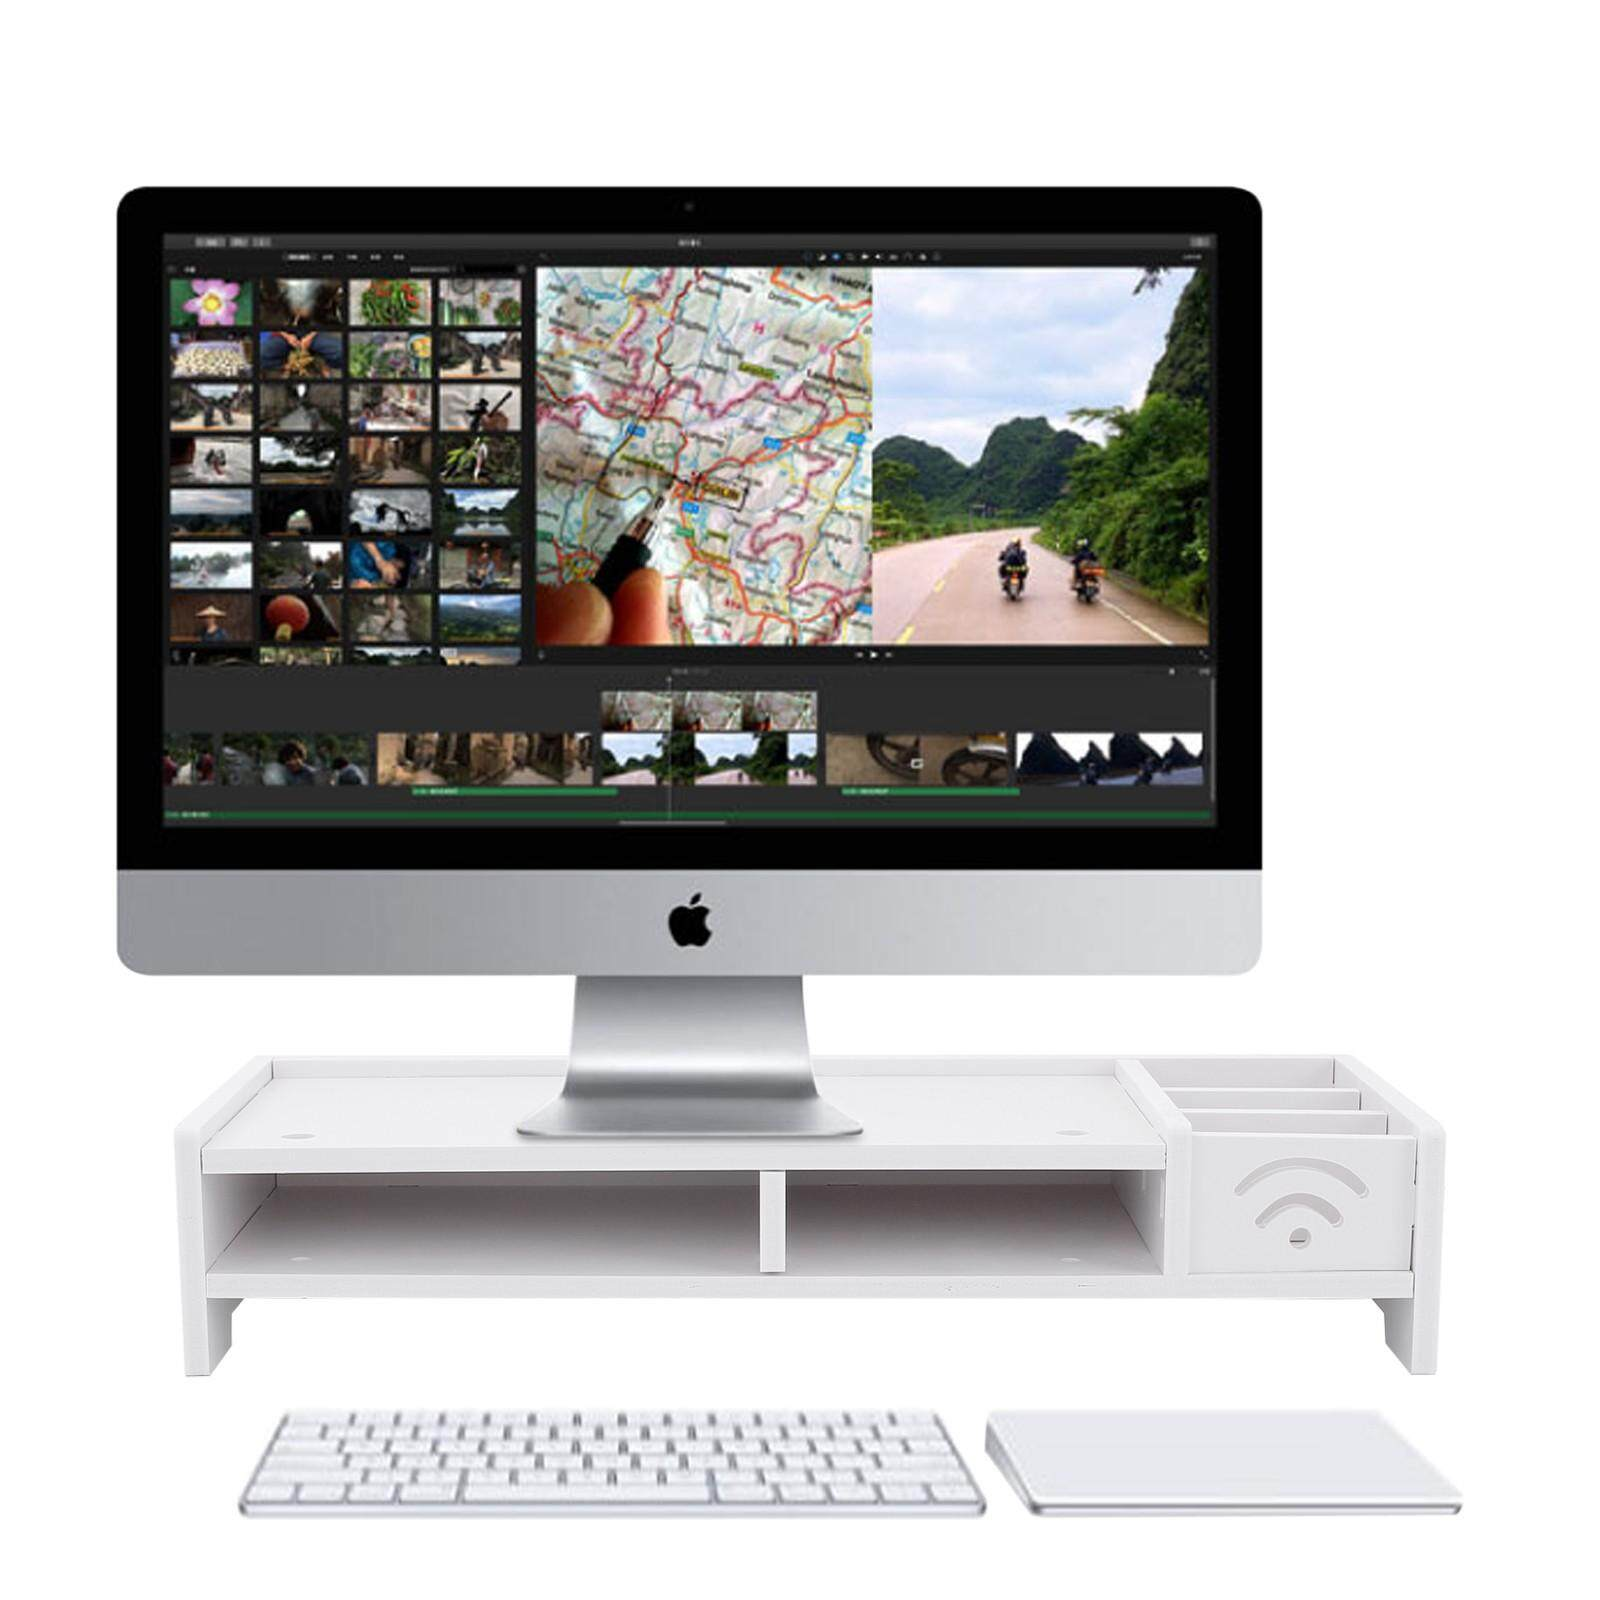 LCD TV Computer Monitor Screen Stand Wooden Desk Riser Keyboard Shelf Rack White - intl